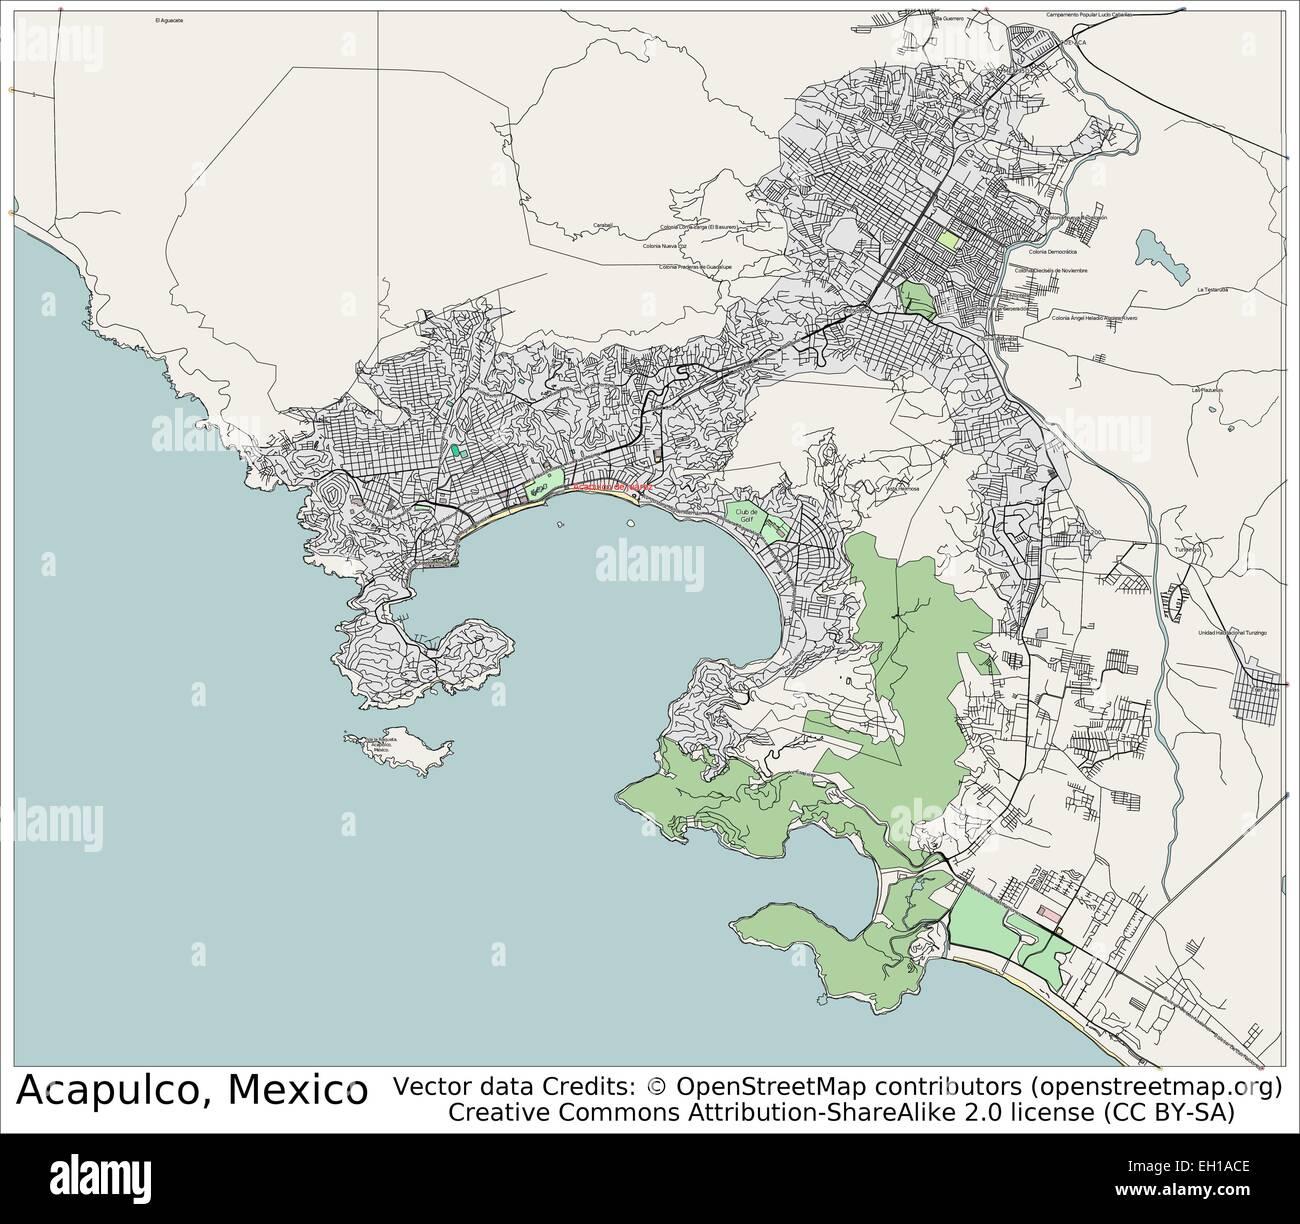 Acapulco Mexico city map Stock Vector Art Illustration Vector